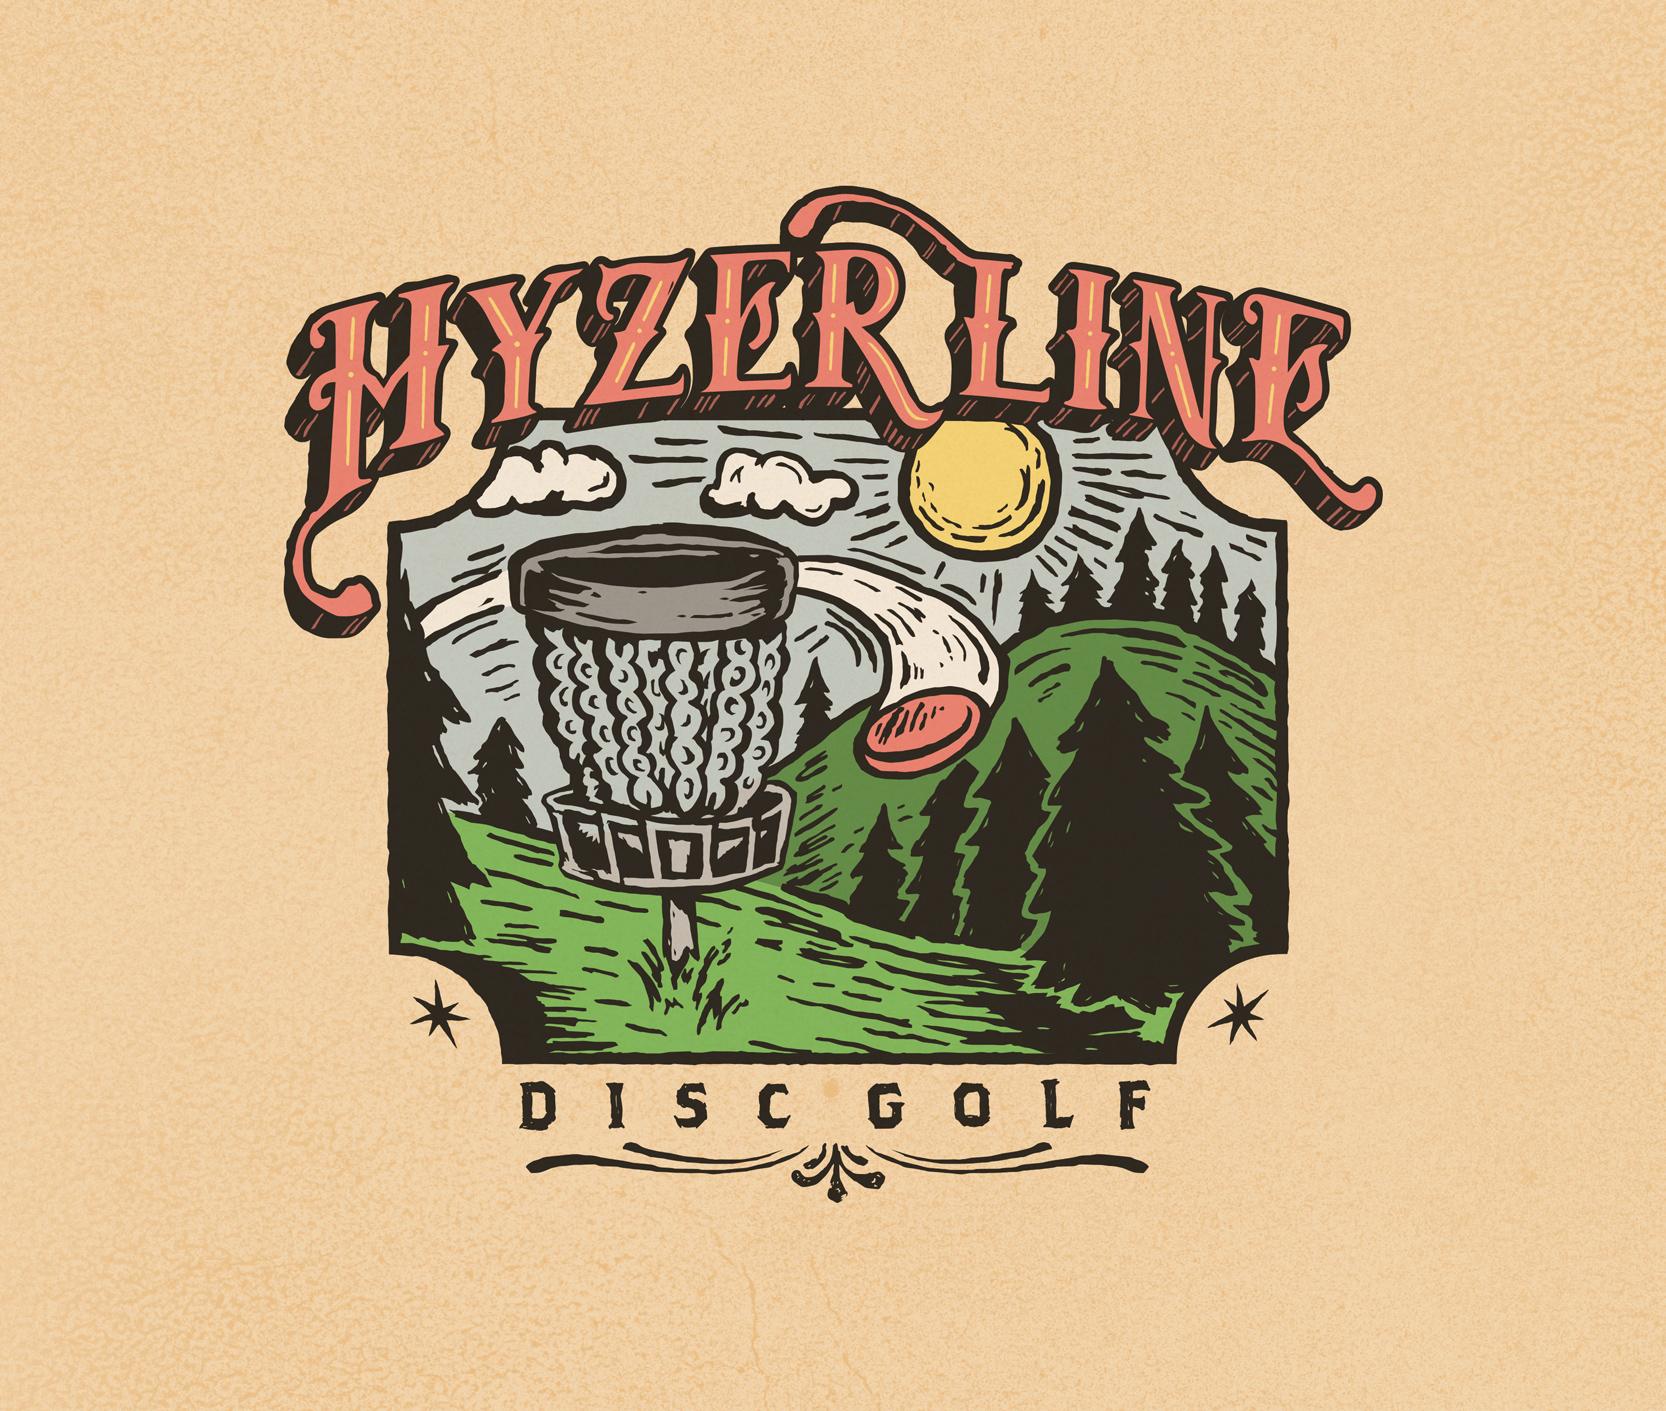 HYZERLINE_final_color.jpg